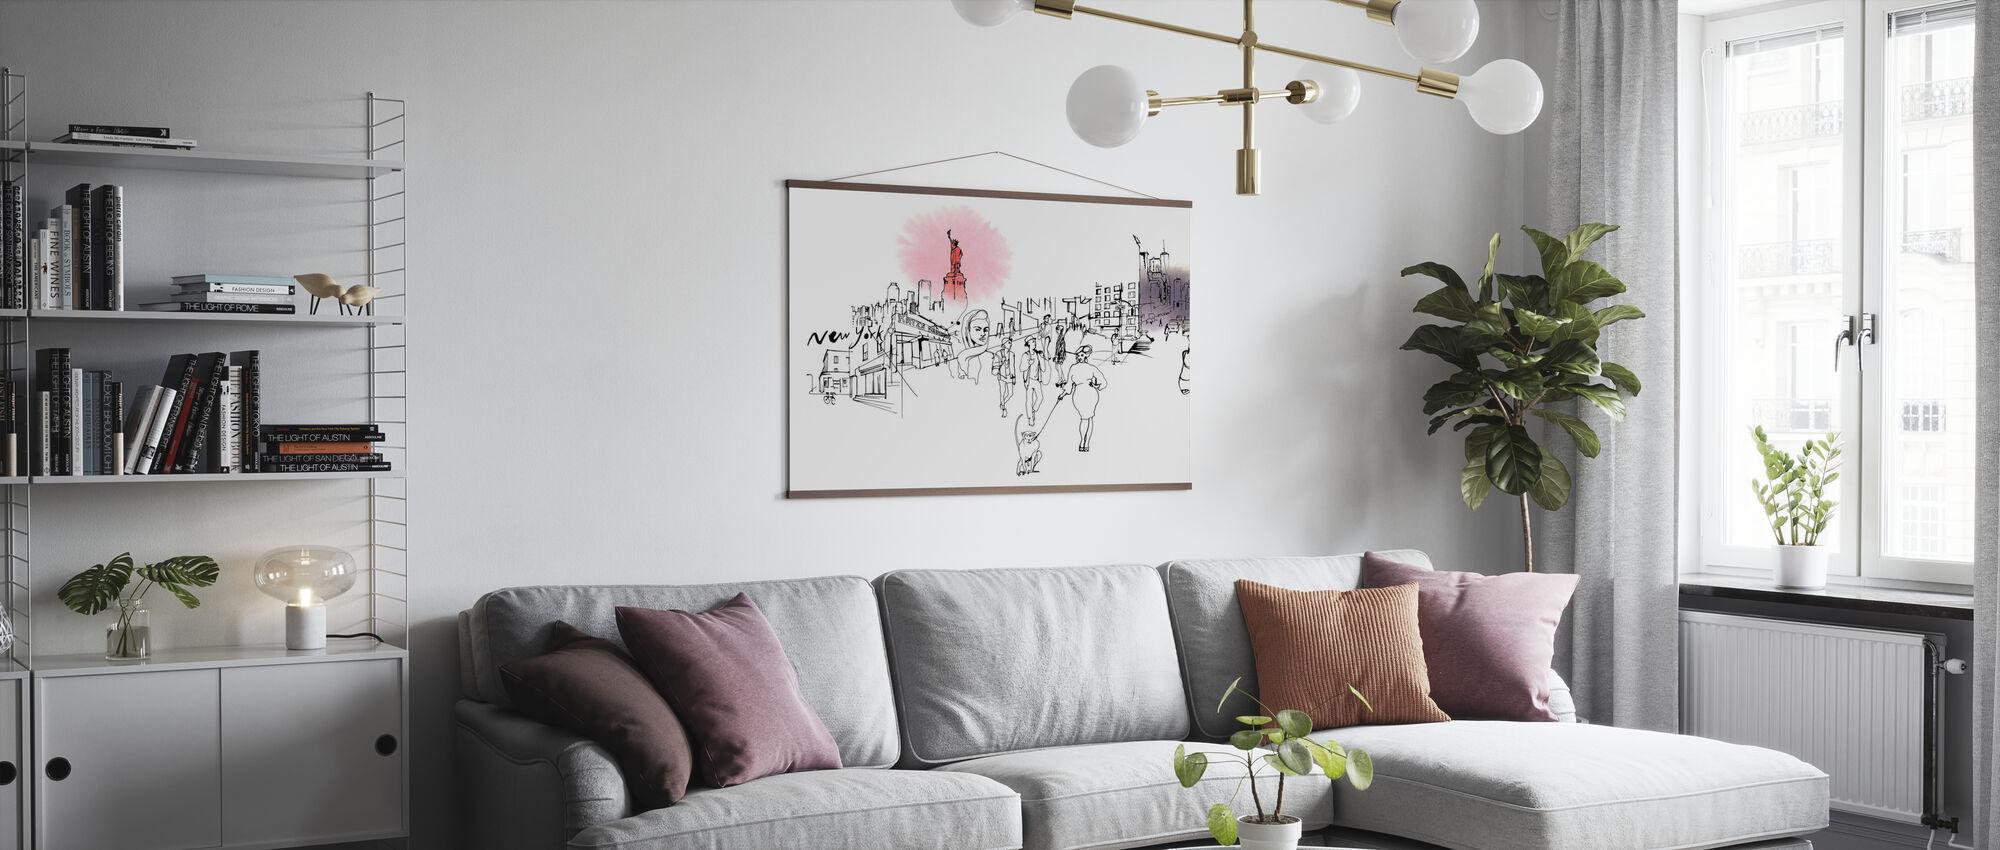 New York City - Katz's Delicatessen - Poster - Living Room